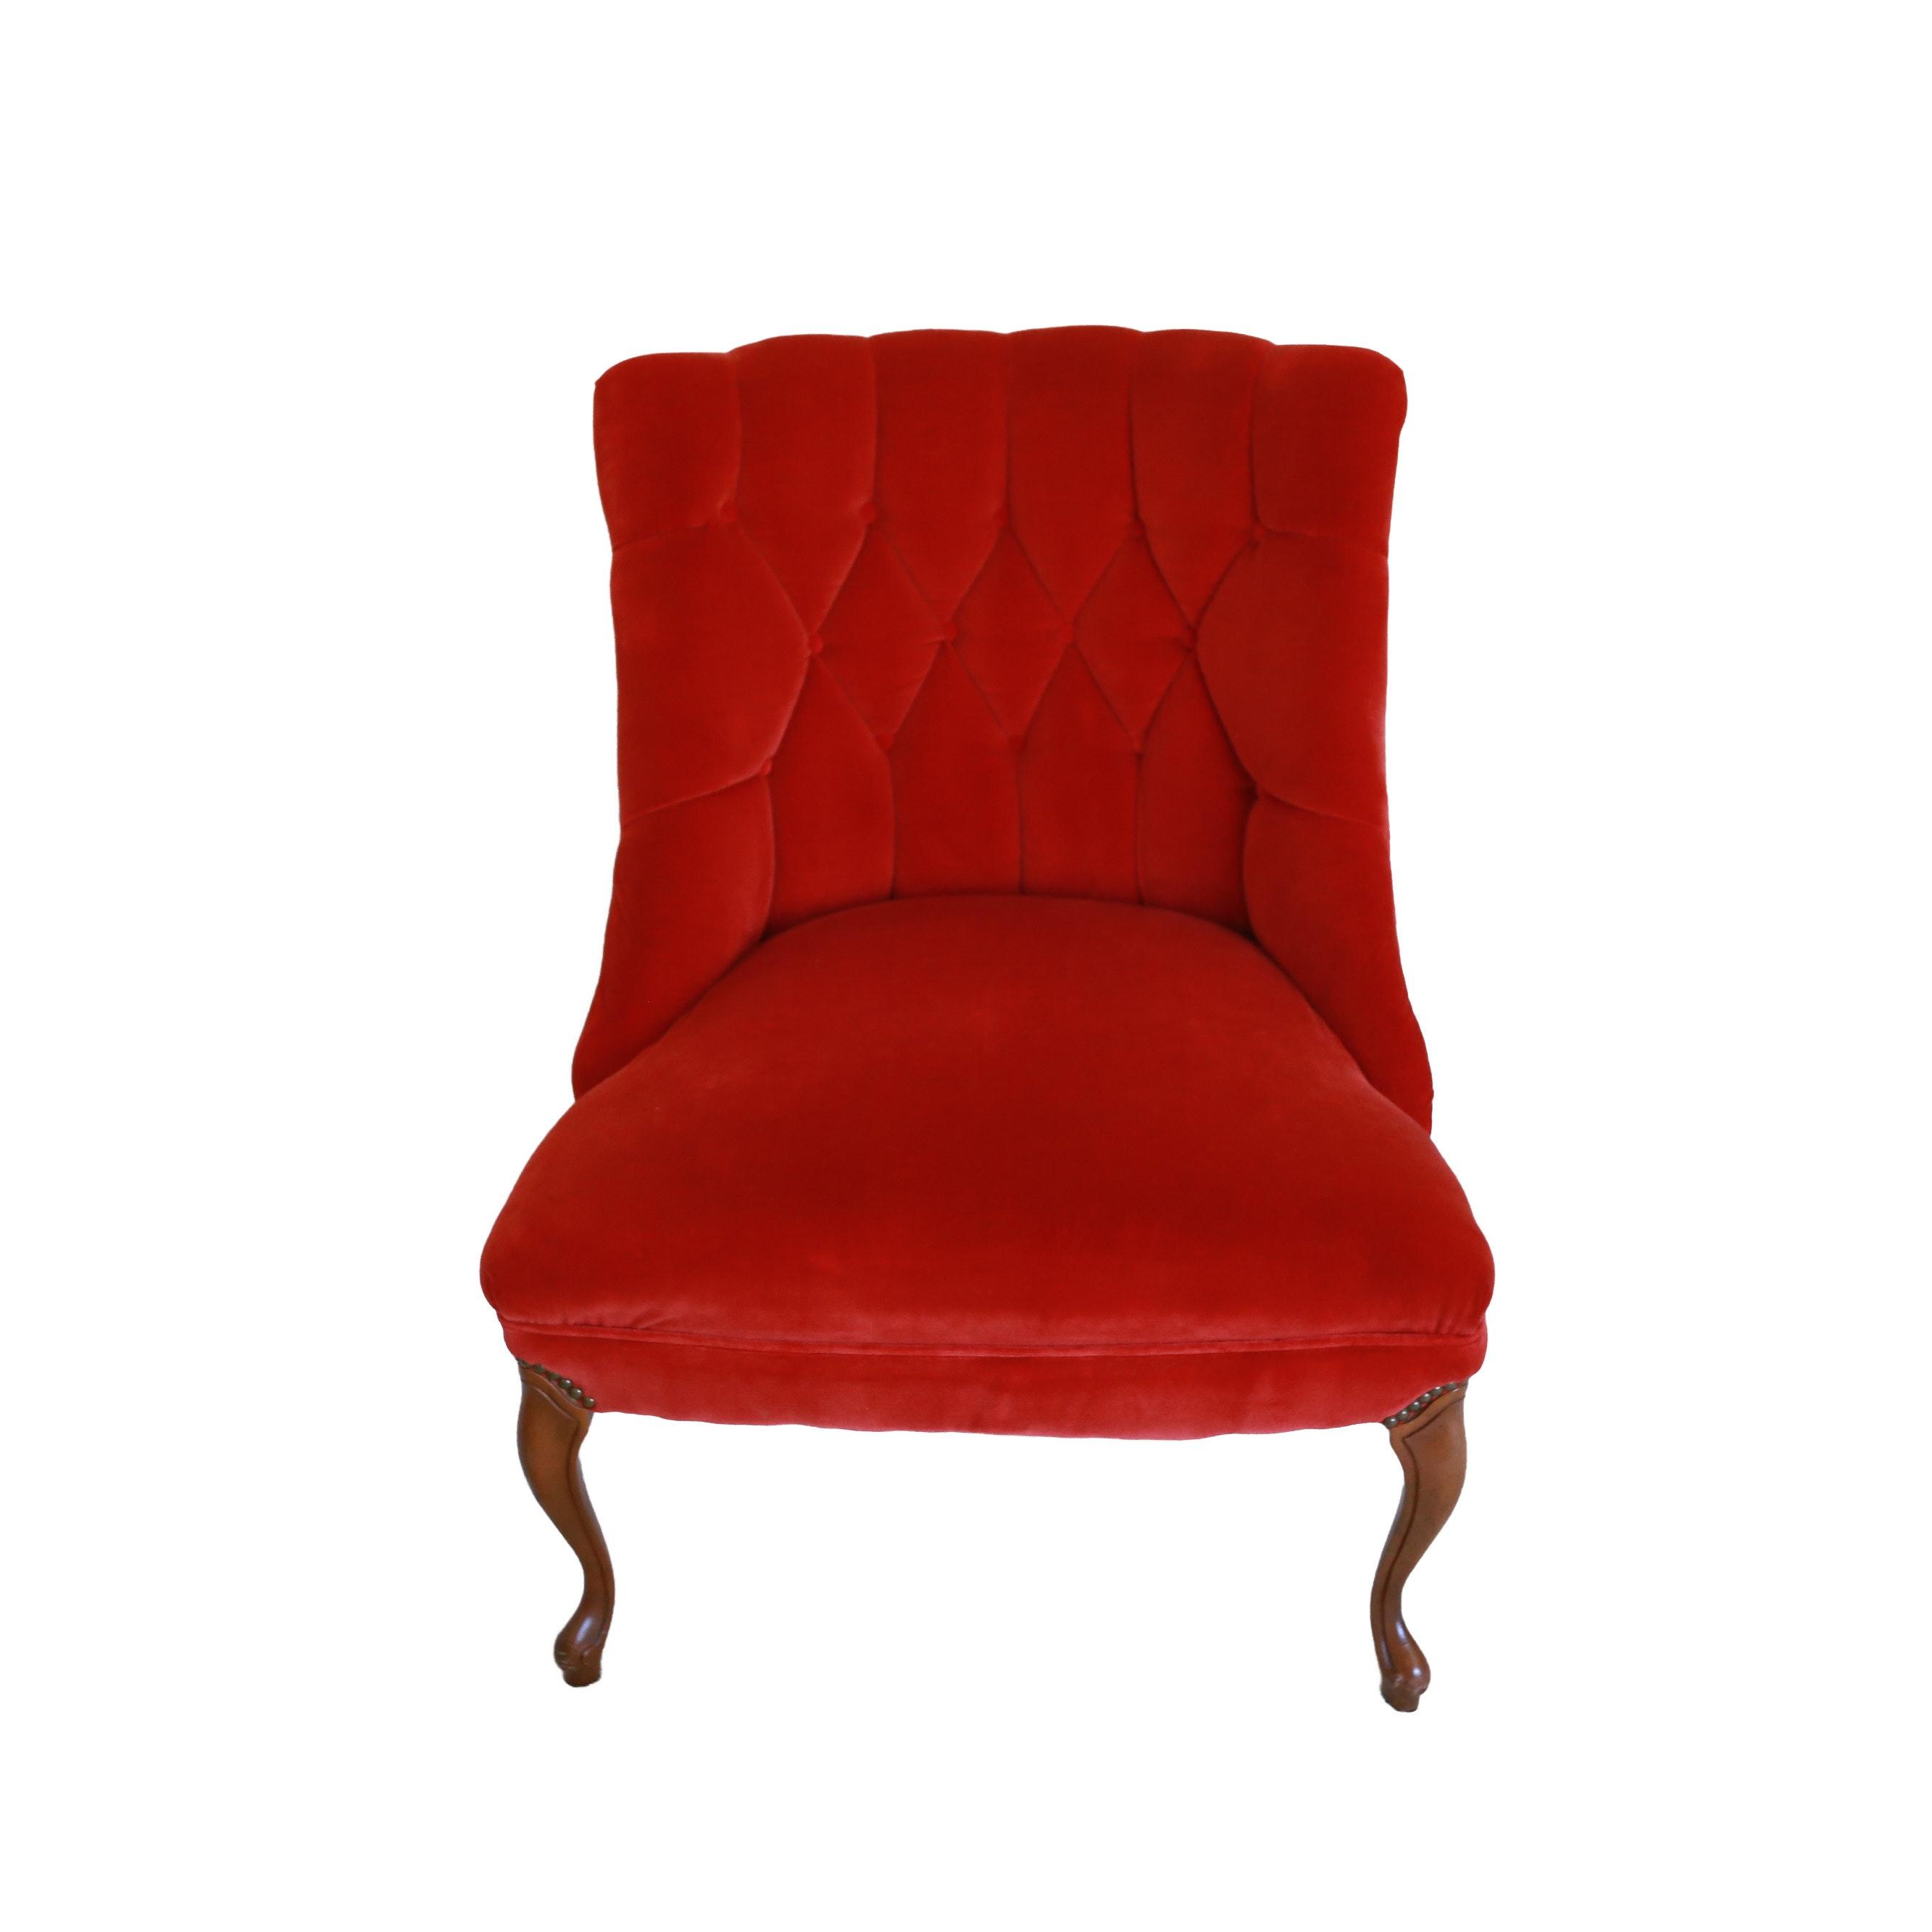 Circa 1970 Tufted Accent Chair